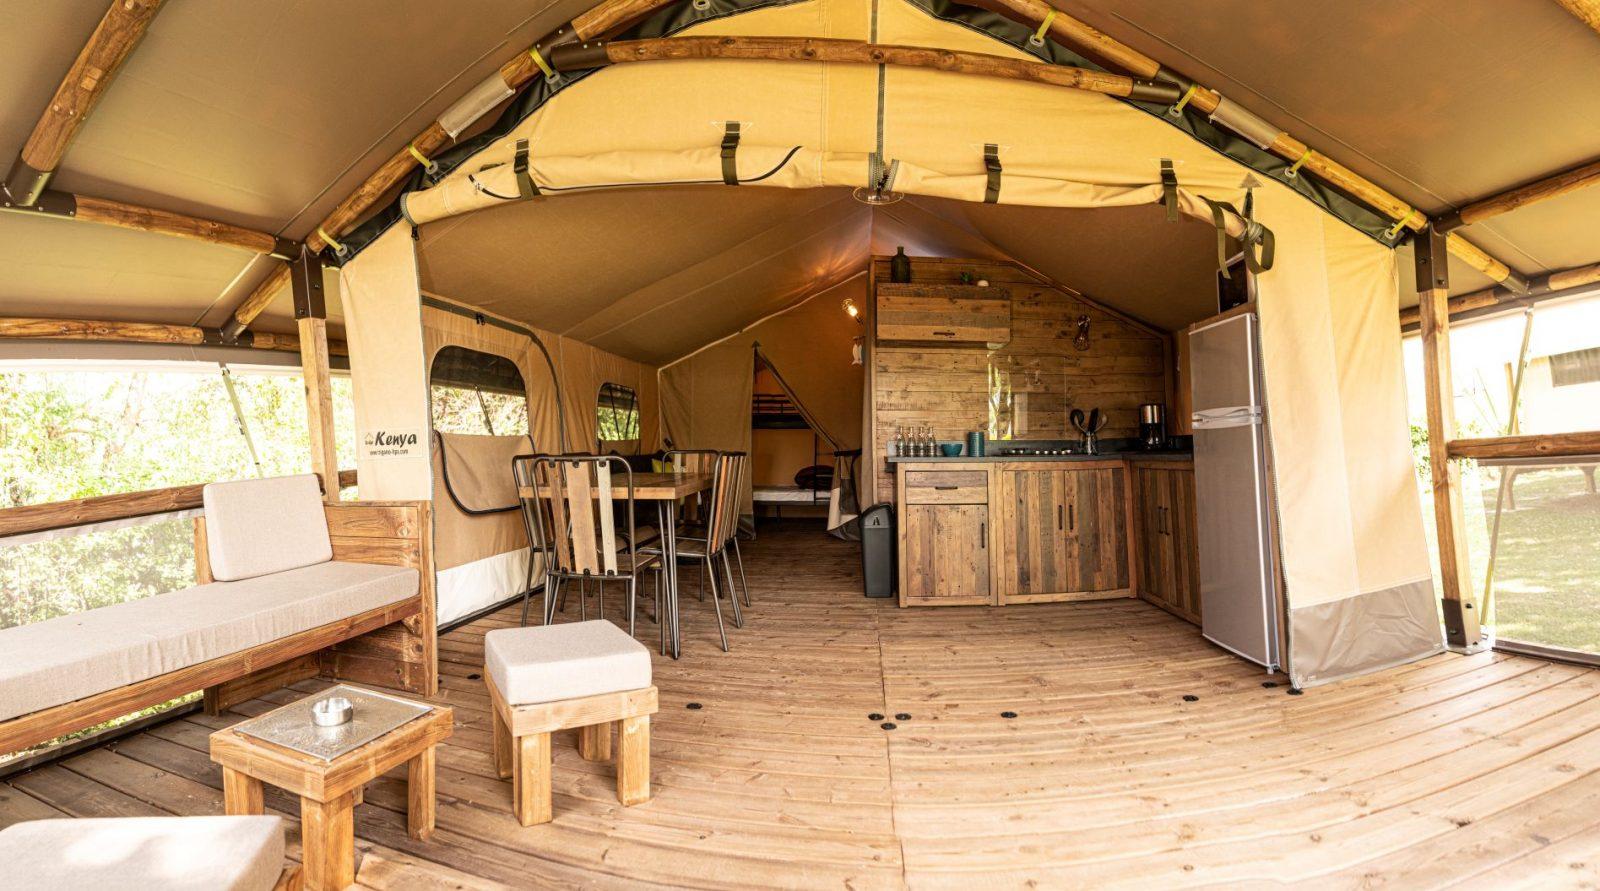 camping-hauterives-drome-trigano-kenya-vintage-panoramique